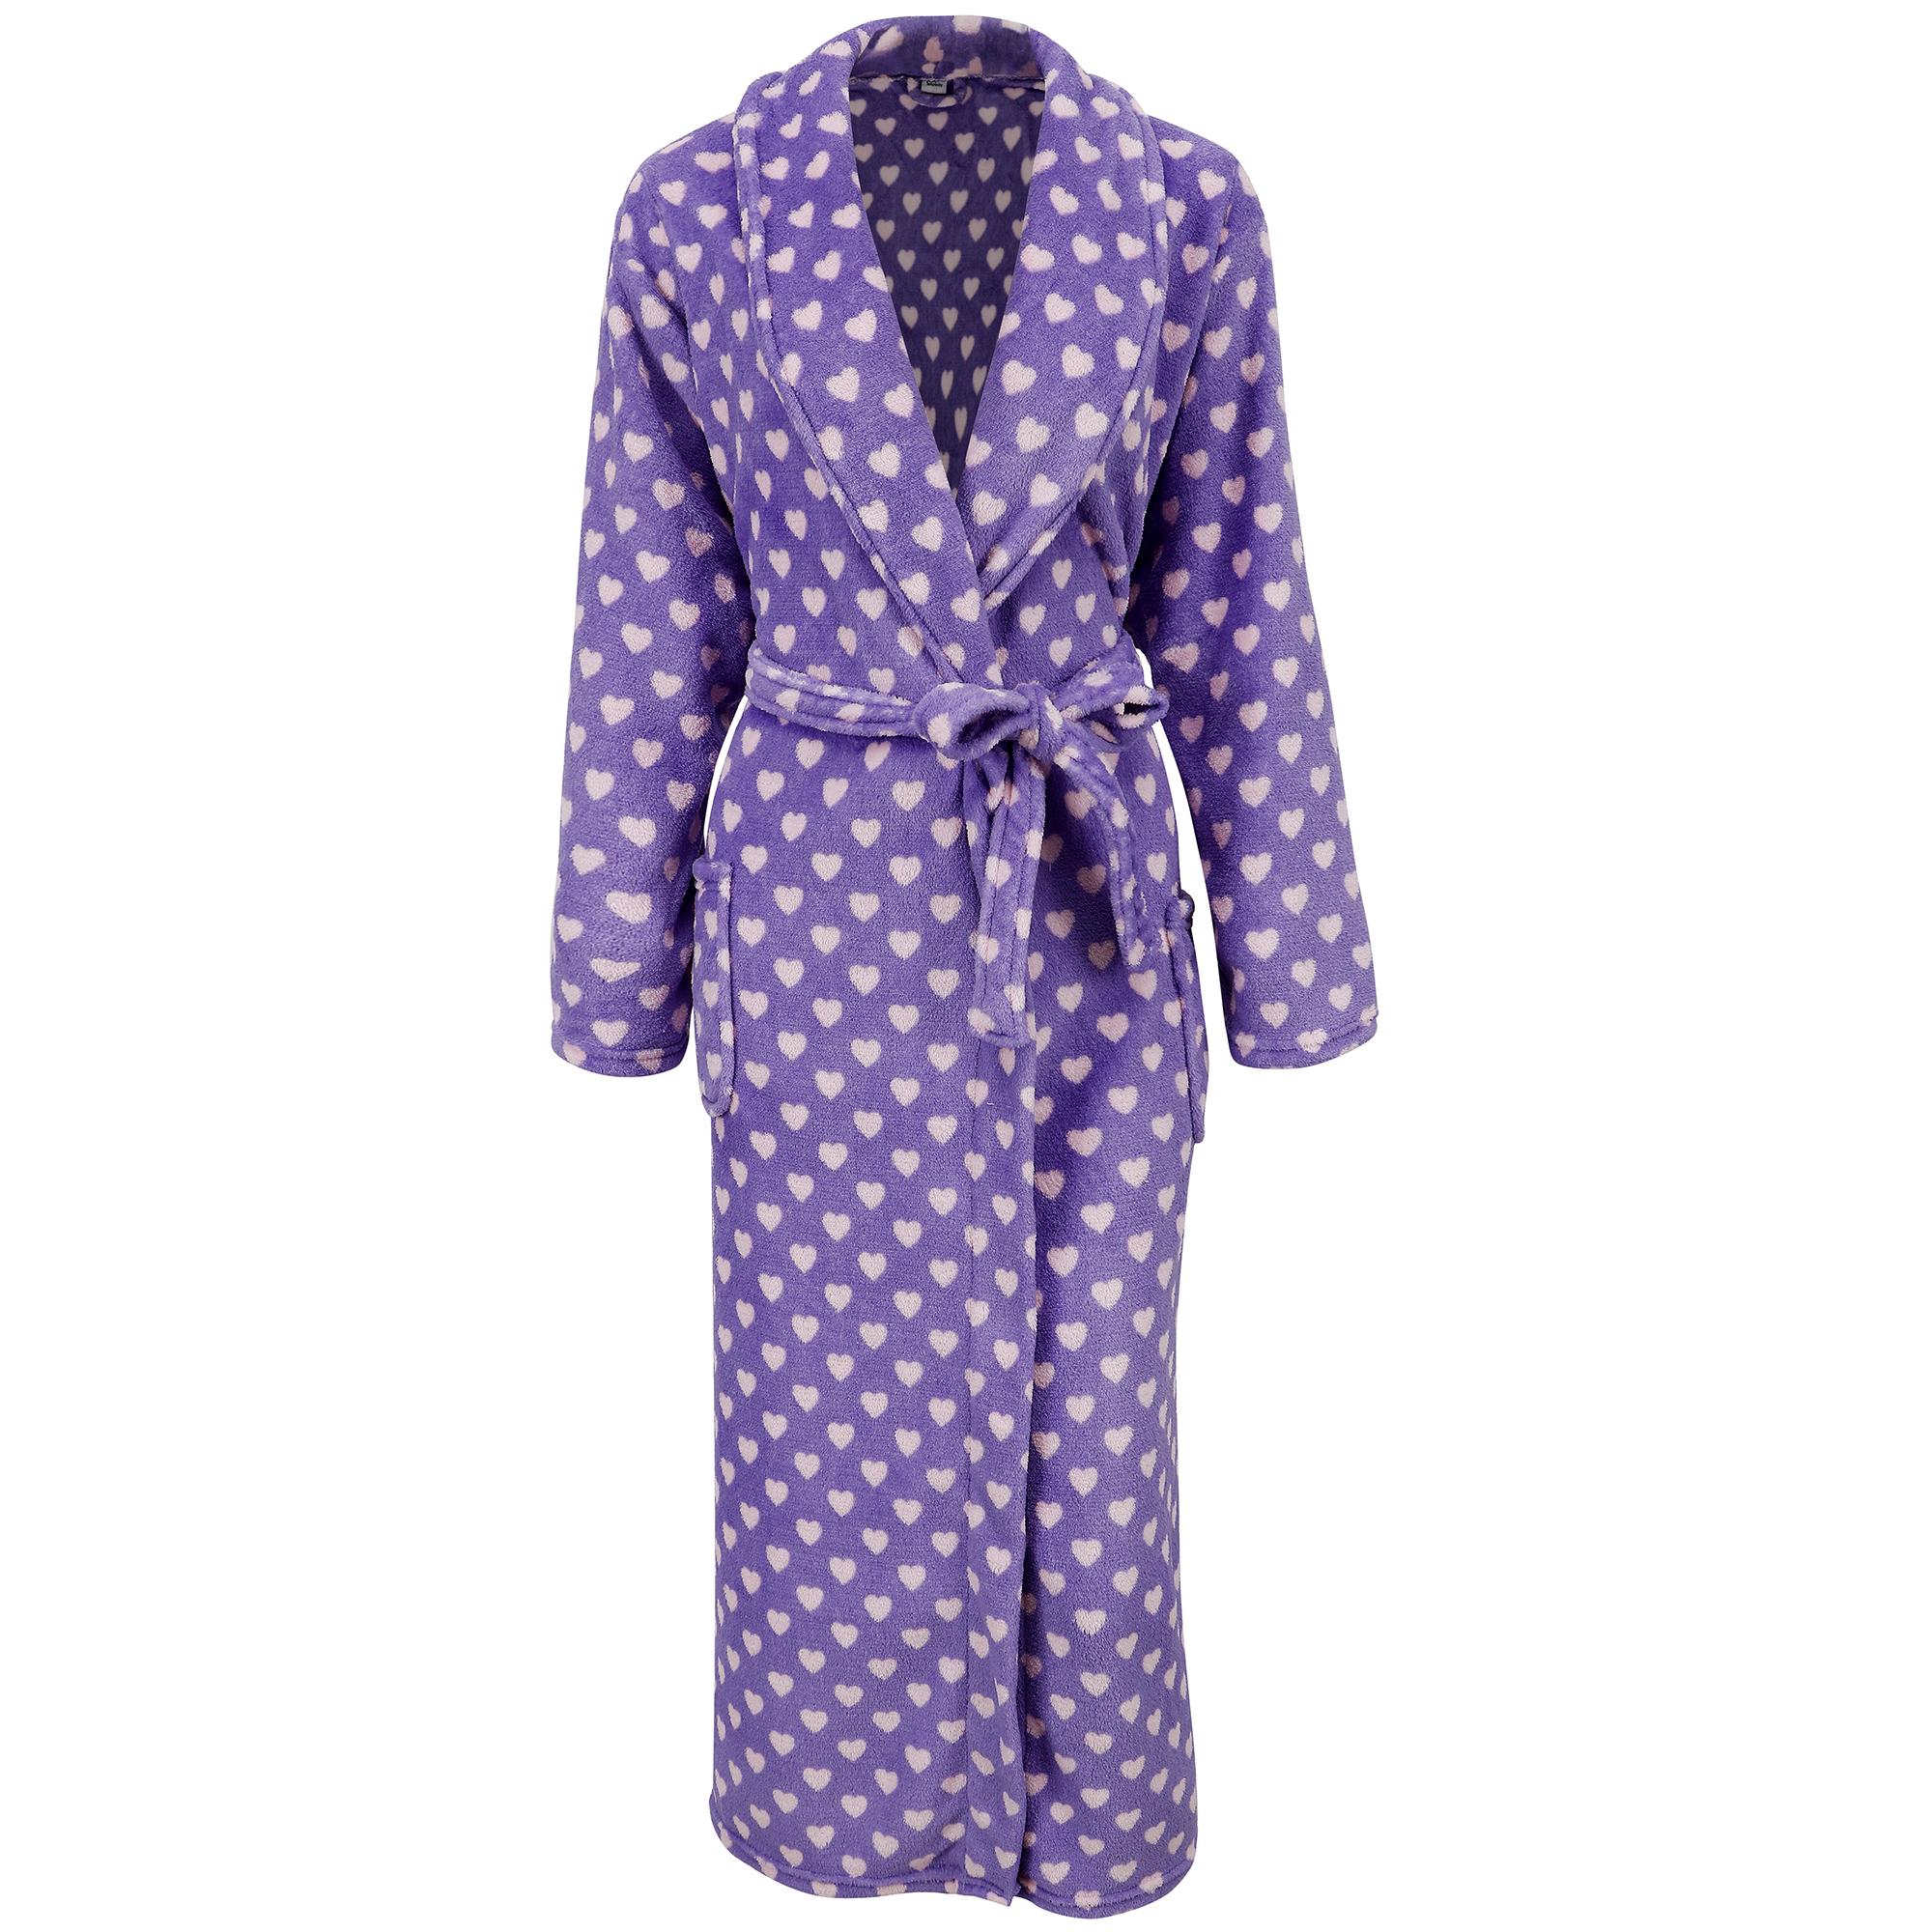 Women's Winter Warm Fleece Plush Kimono Bathrobe with Poc...